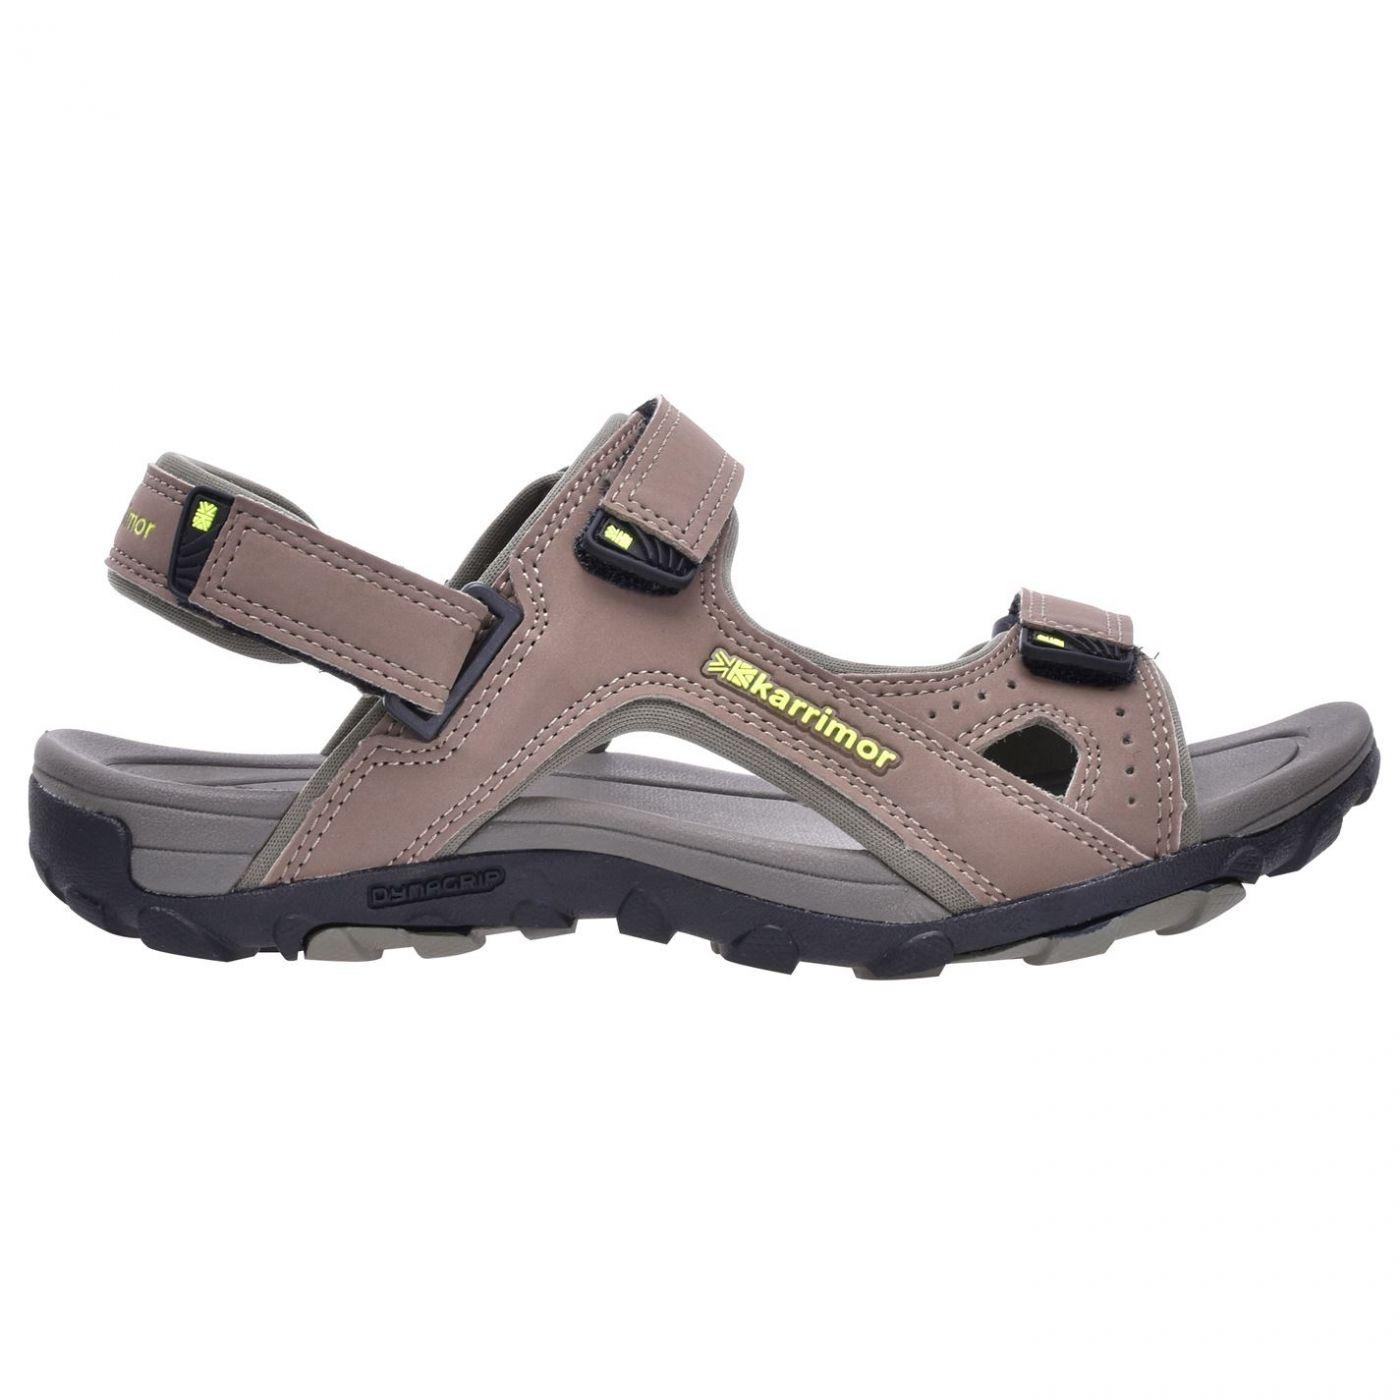 Karrimor Antibes Ladies Sandals